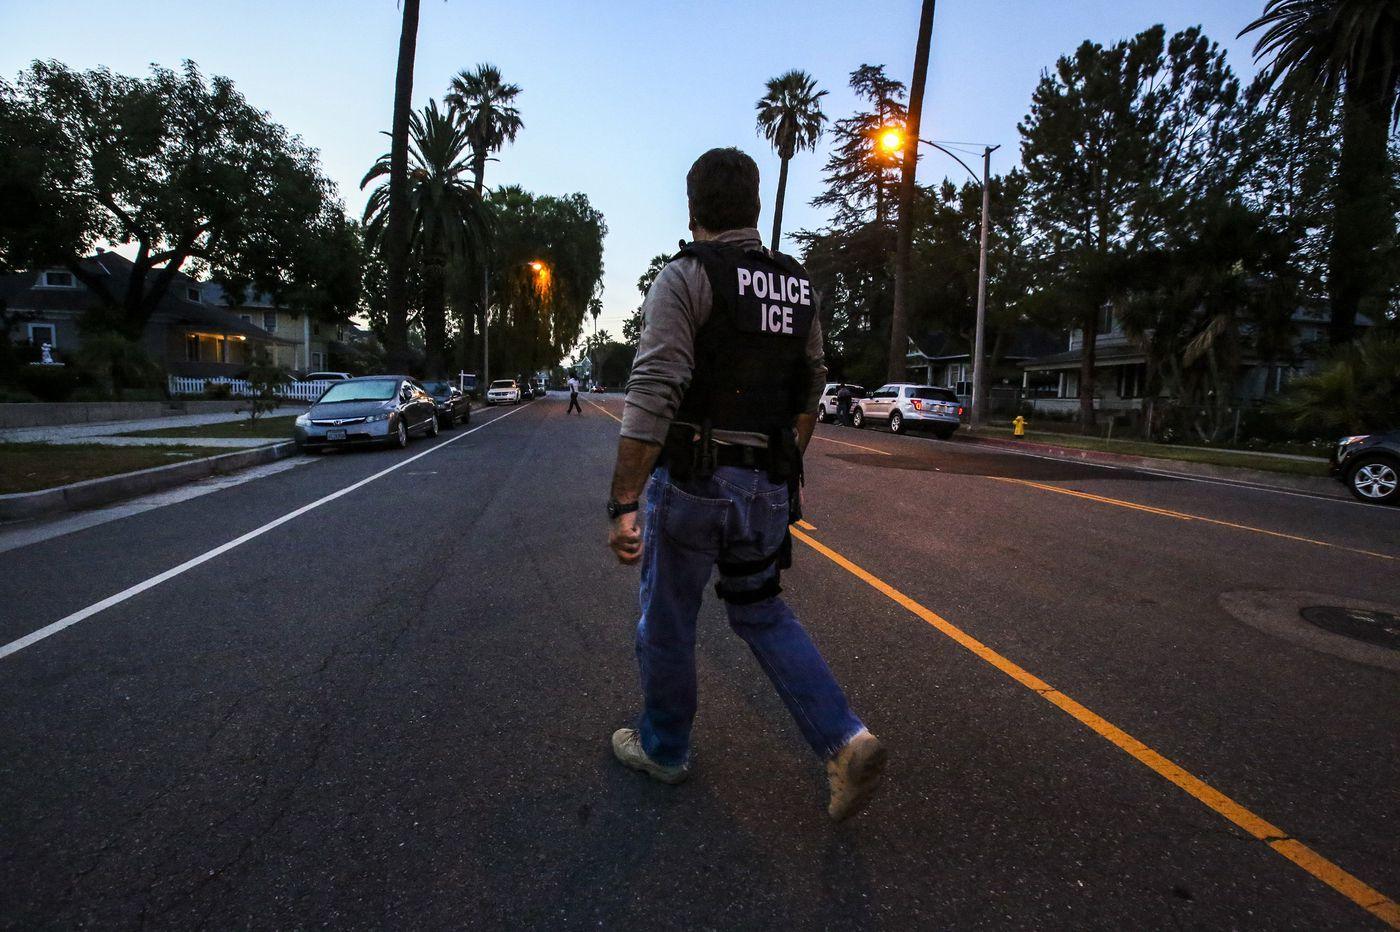 Immigration groups sue to block Trump's Sunday ICE raids